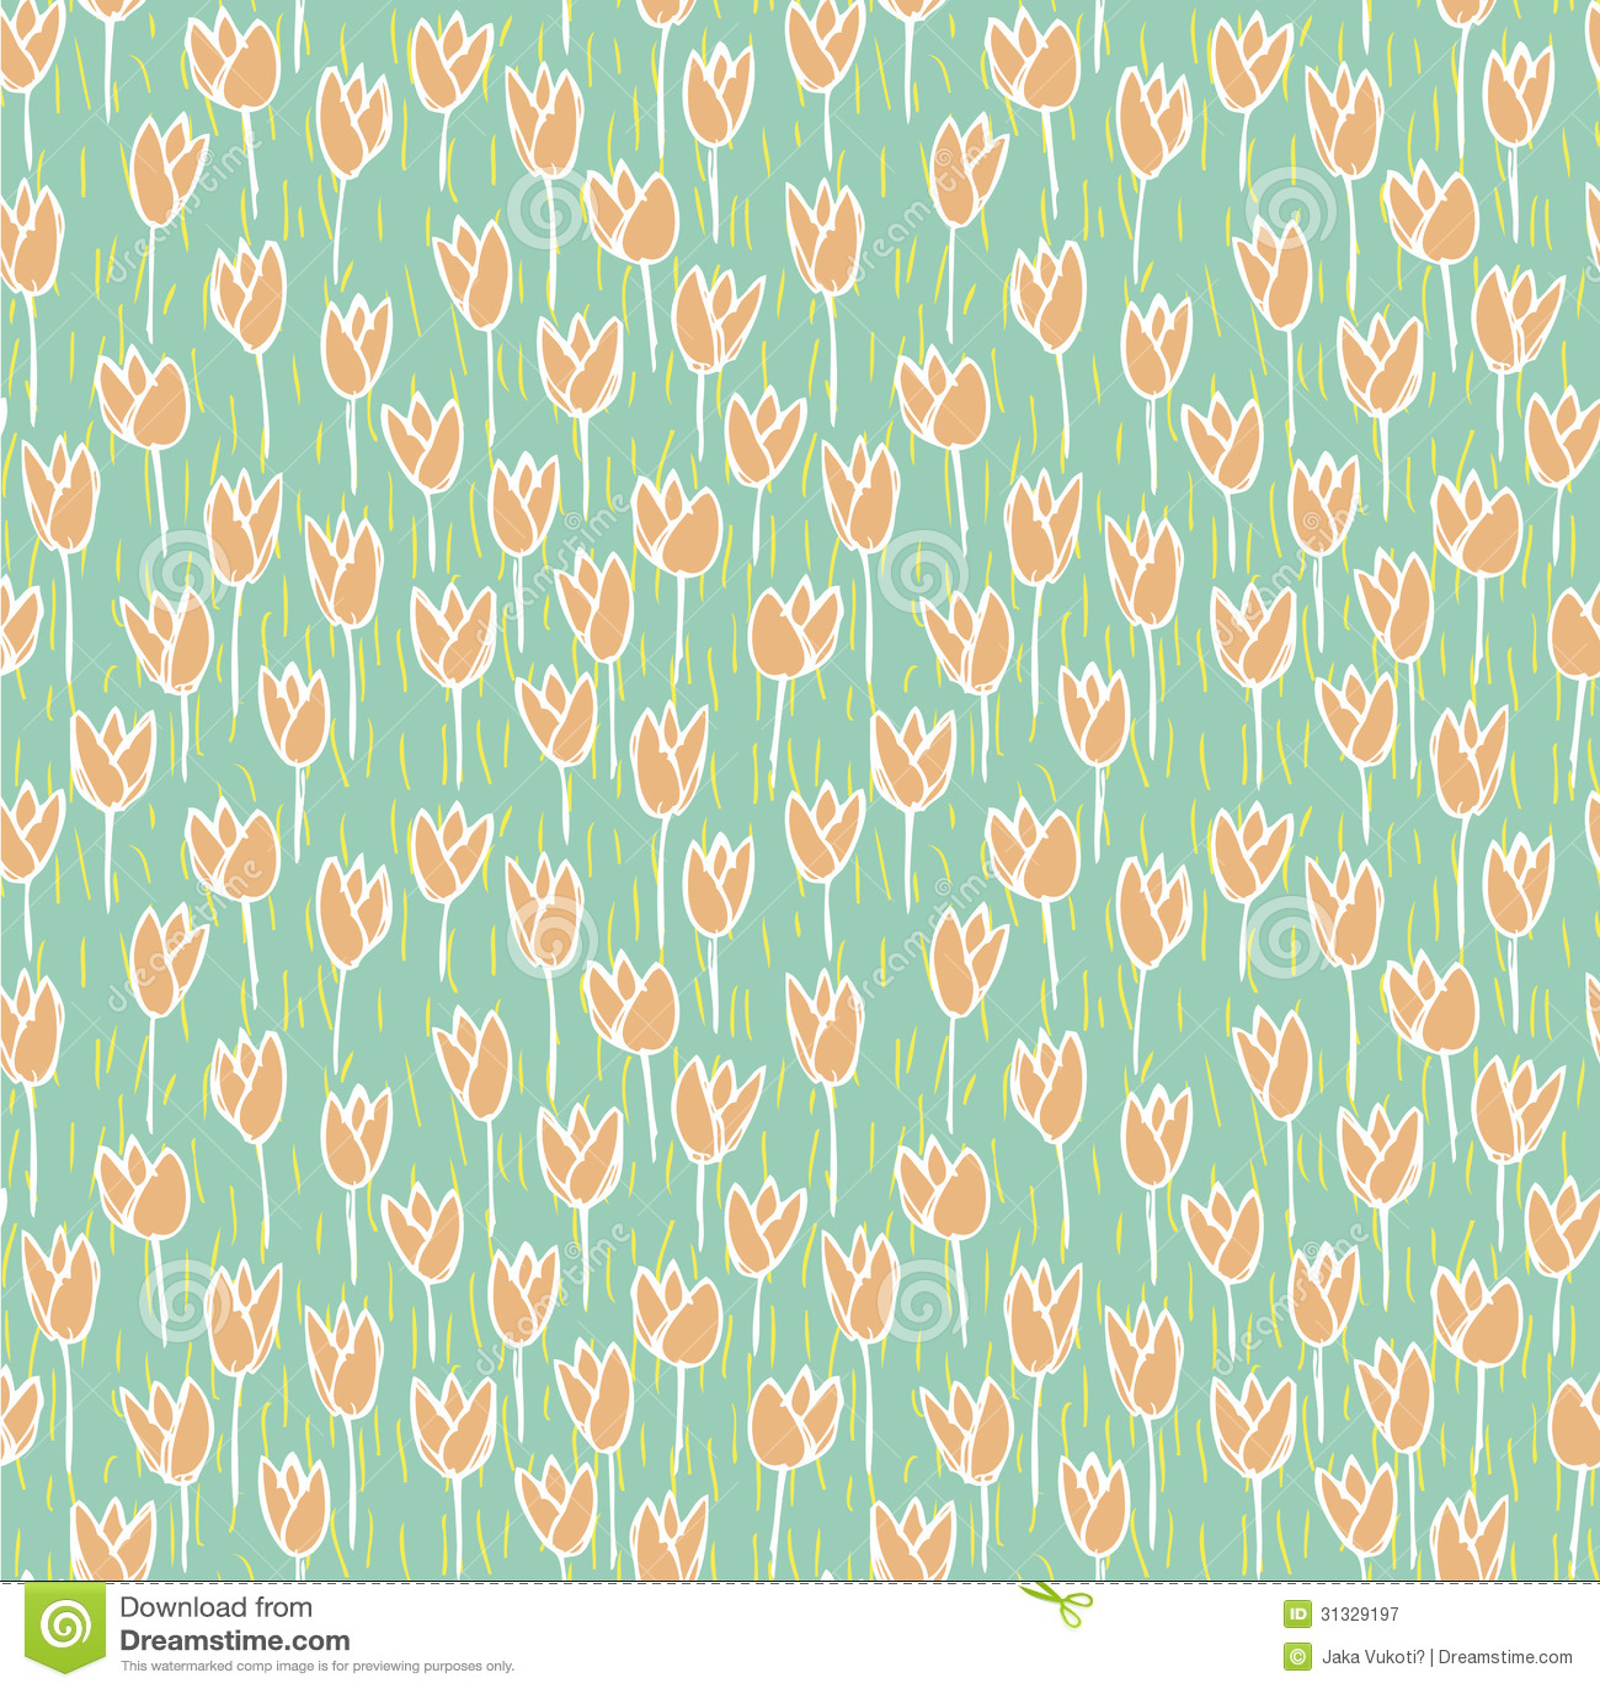 Cute Drawing Wallpaper Download Tulip Field Seamless Pattern Royalty Free Stock